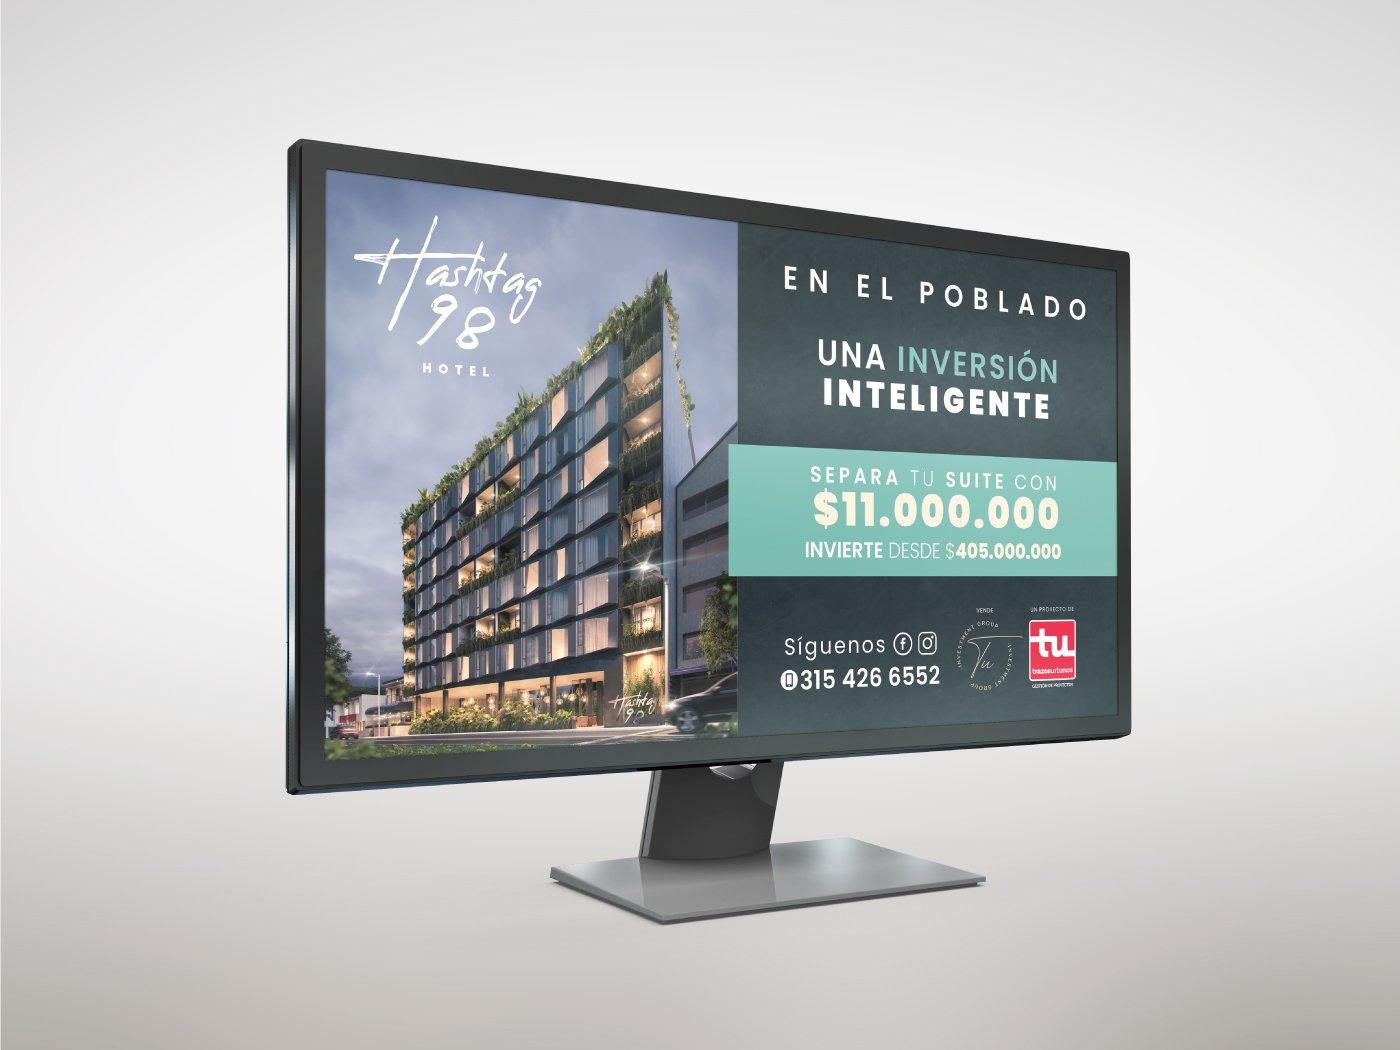 Hashtag-98 Publicidad Inmobiliaria